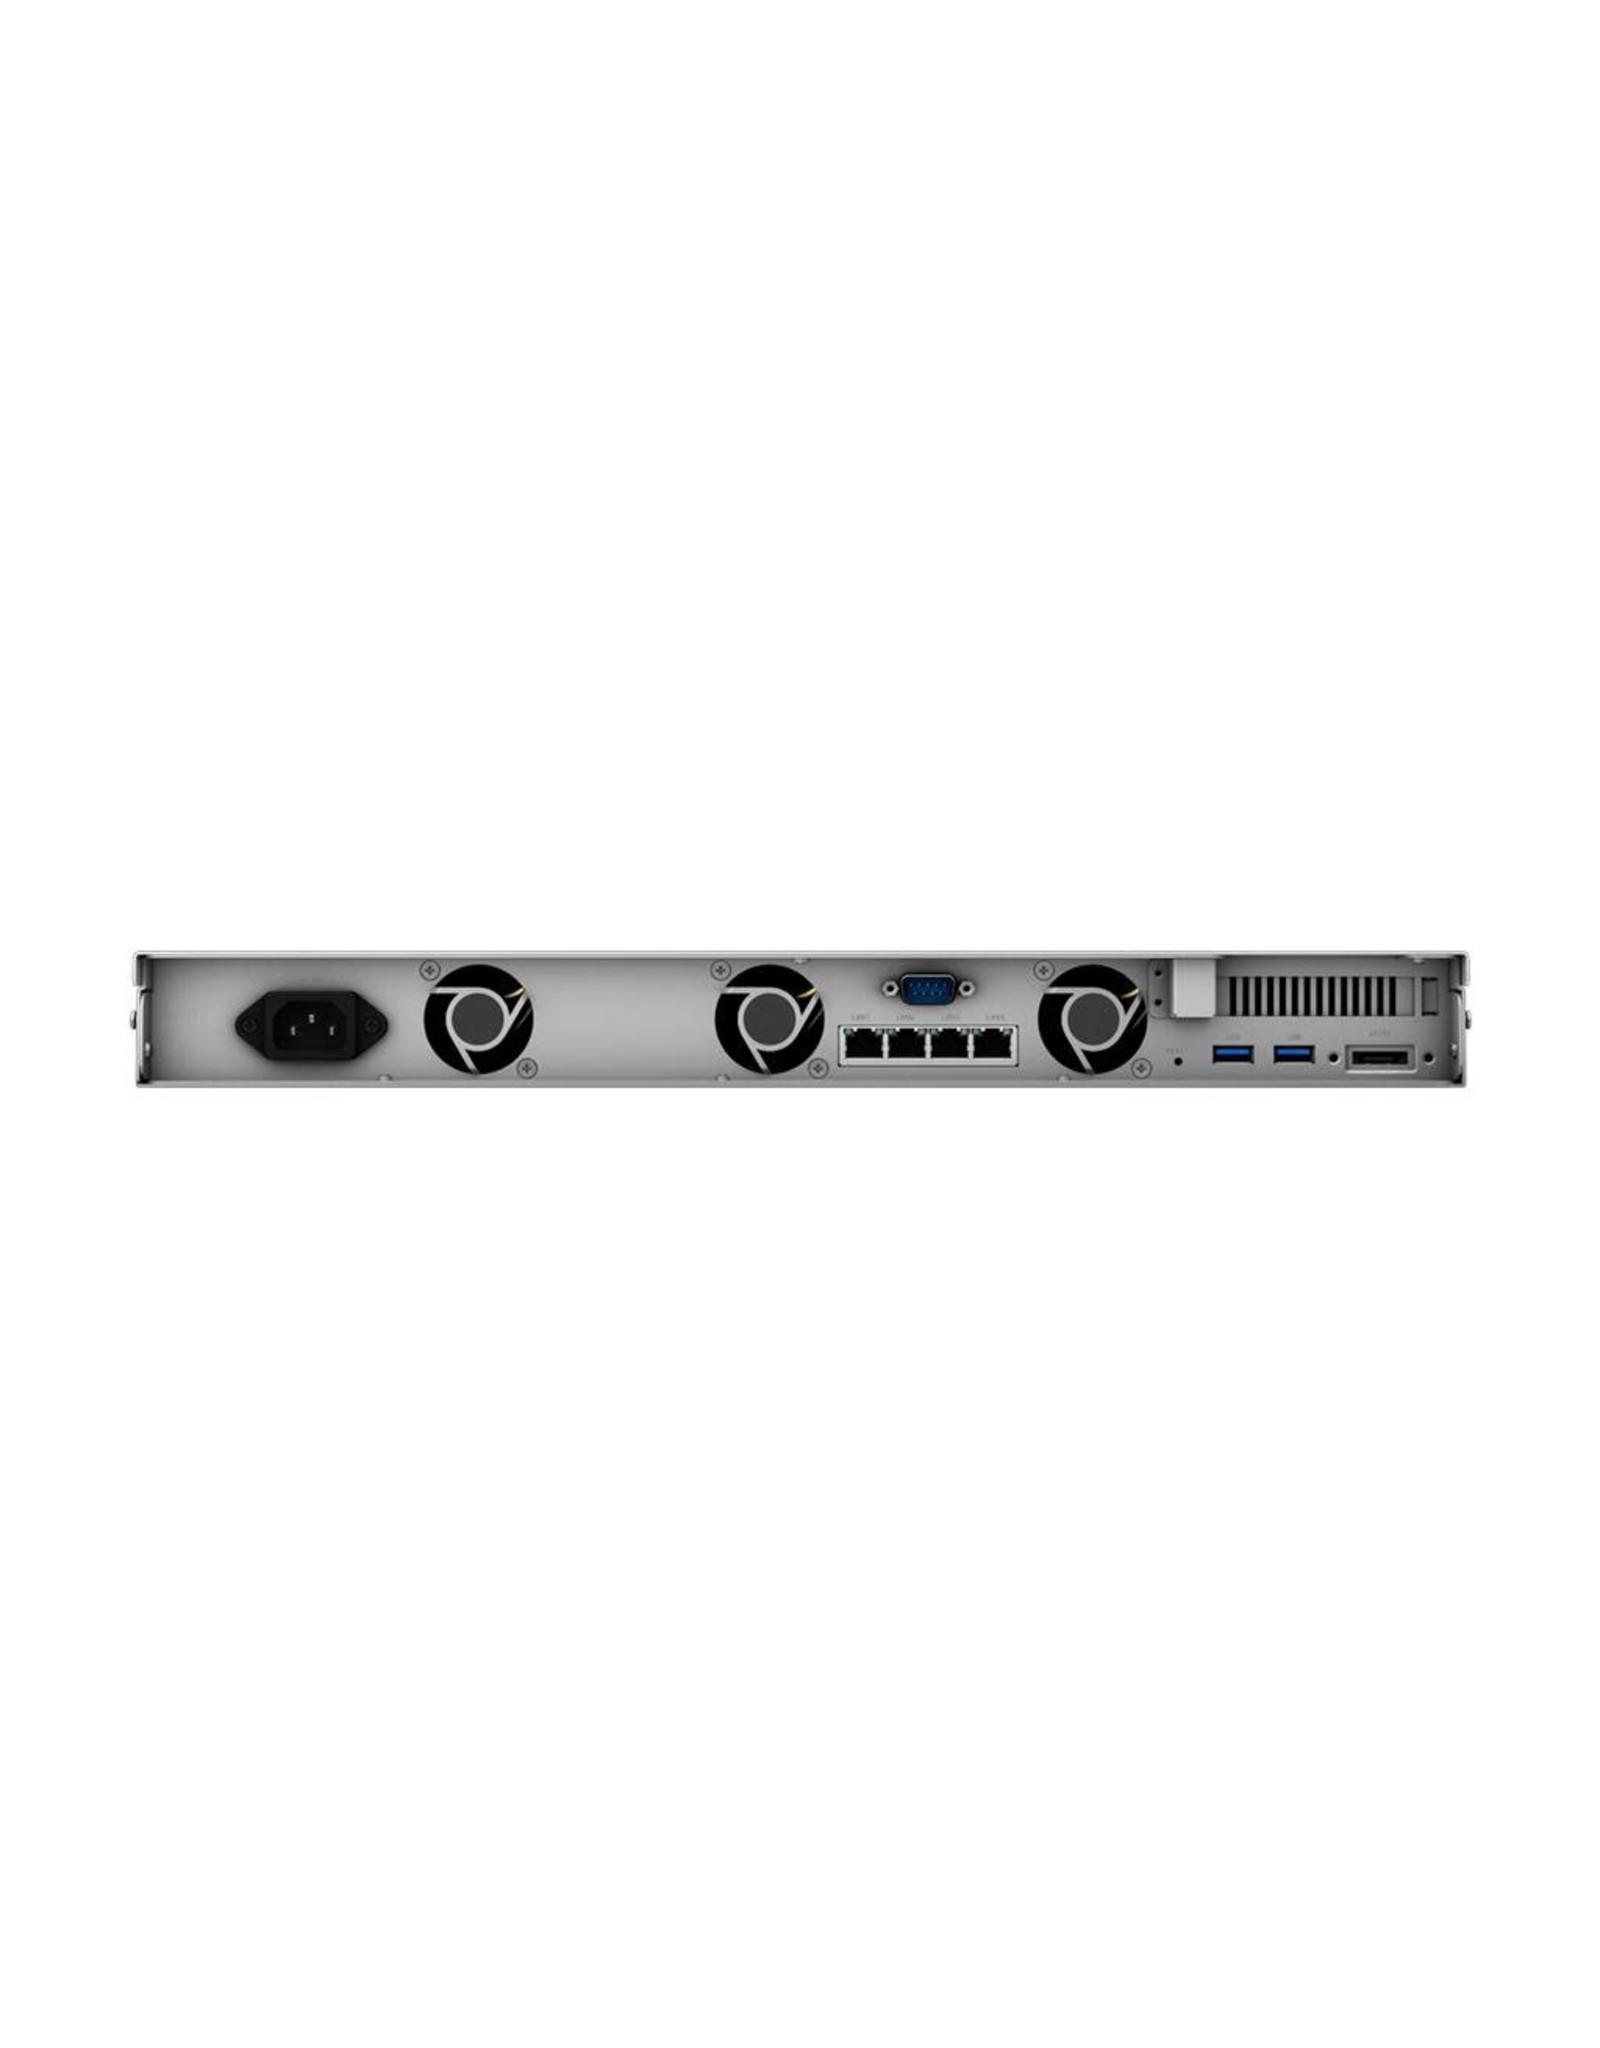 Synology Synology RS818+ 16TB 4-Bay 1RU High Performance 2.4GHz Quadcore NAS Server (4x4TB Value Enterprise HDD 5YR)